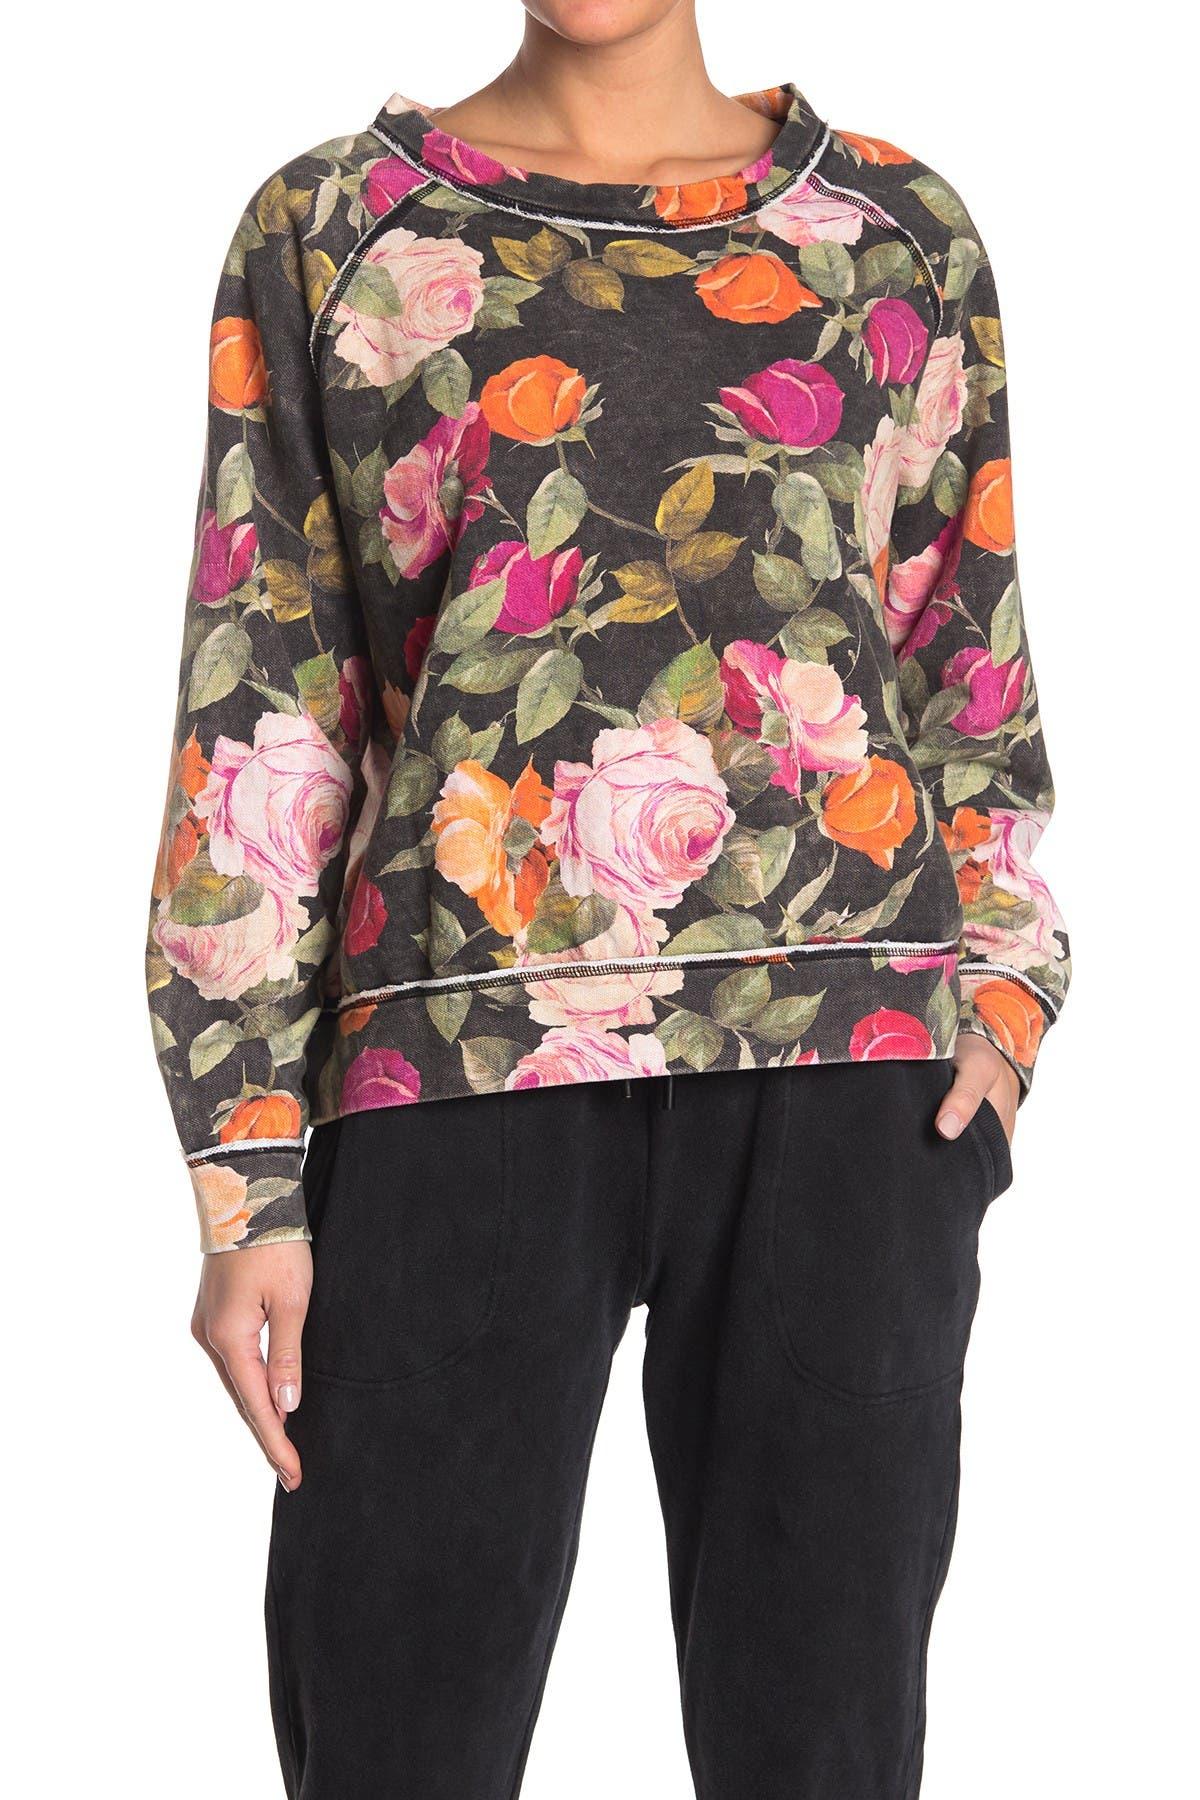 Image of Nicole Miller Floral Print Sweatshirt